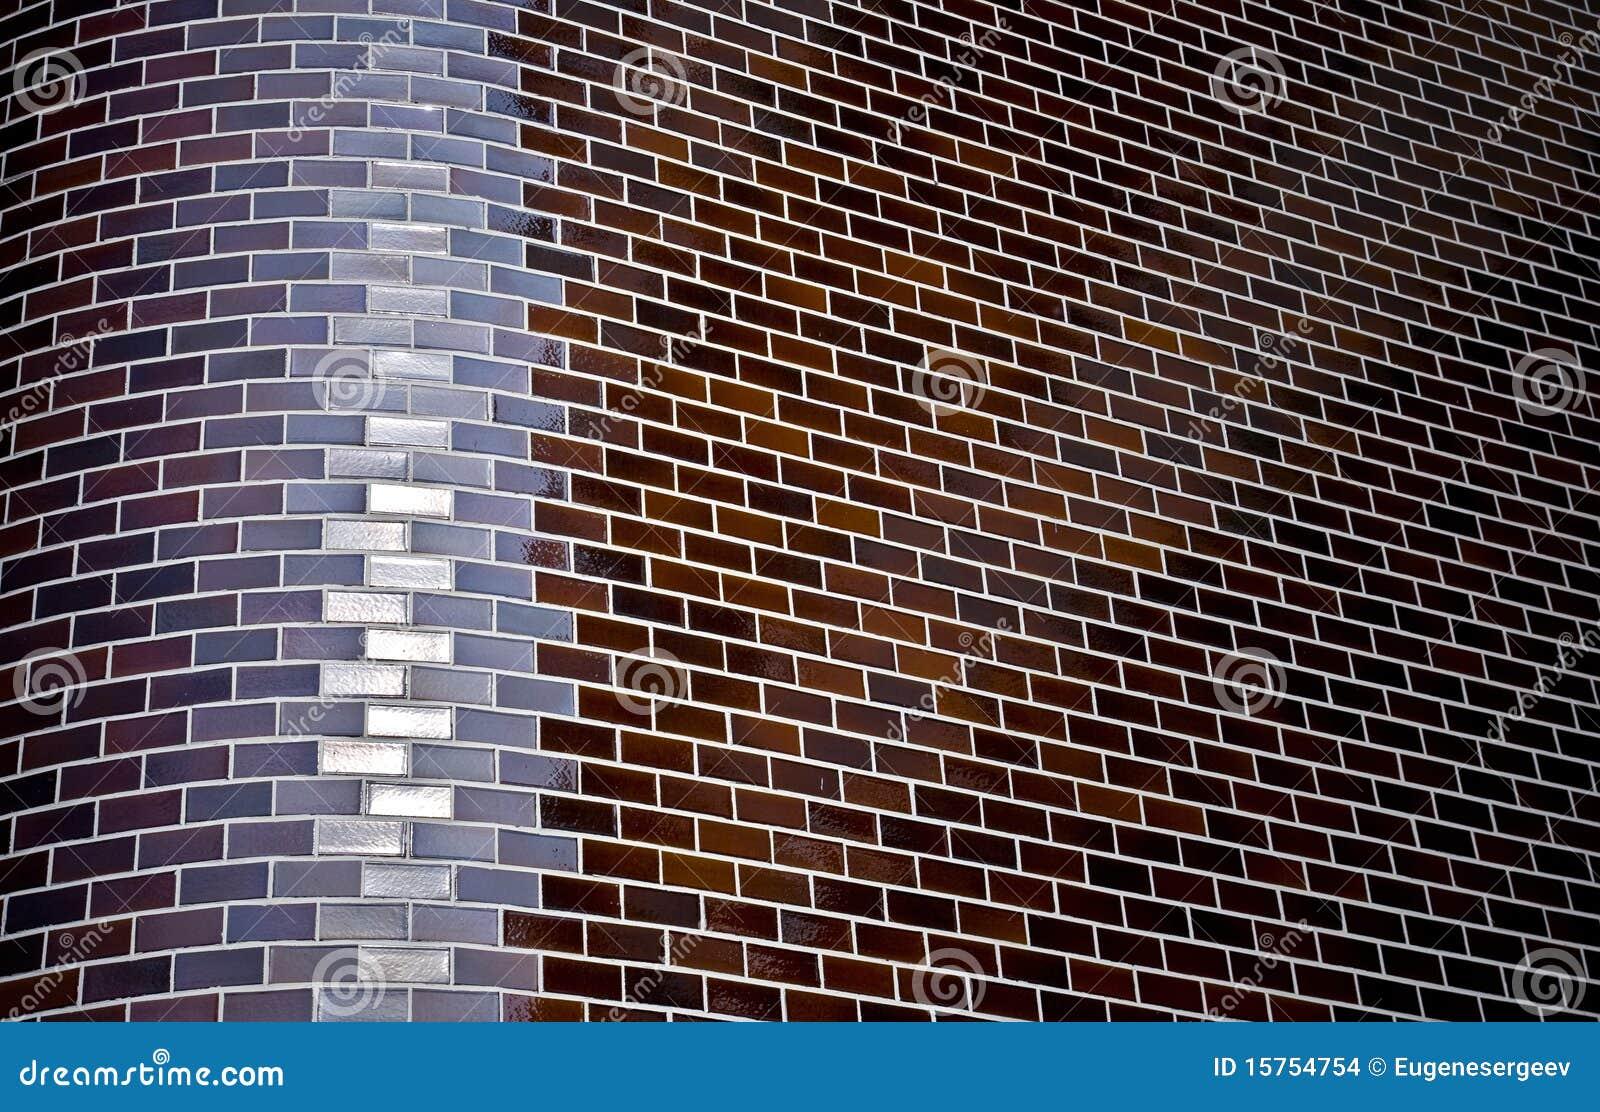 Wall Brick Decoration